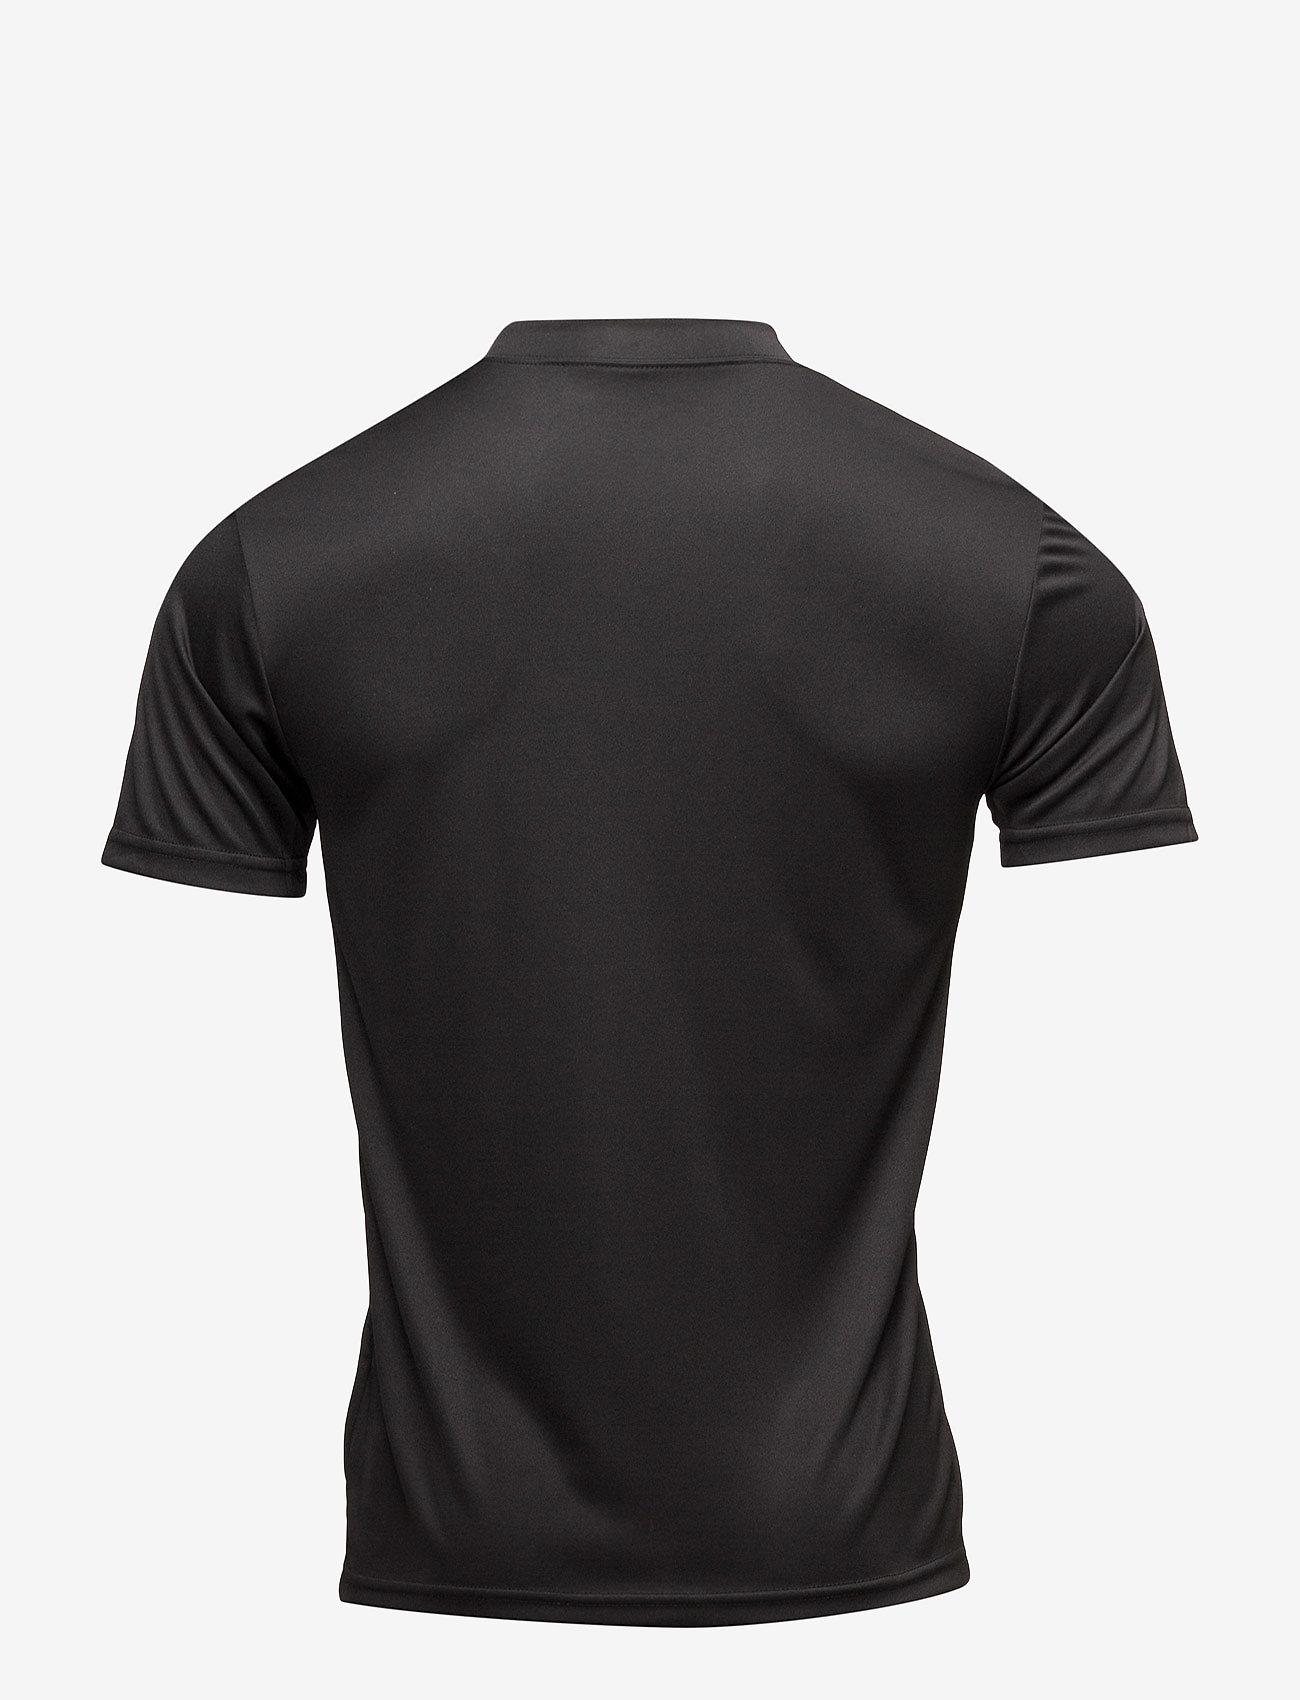 Craft - PRIME TEE M - sporta topi - black - 1